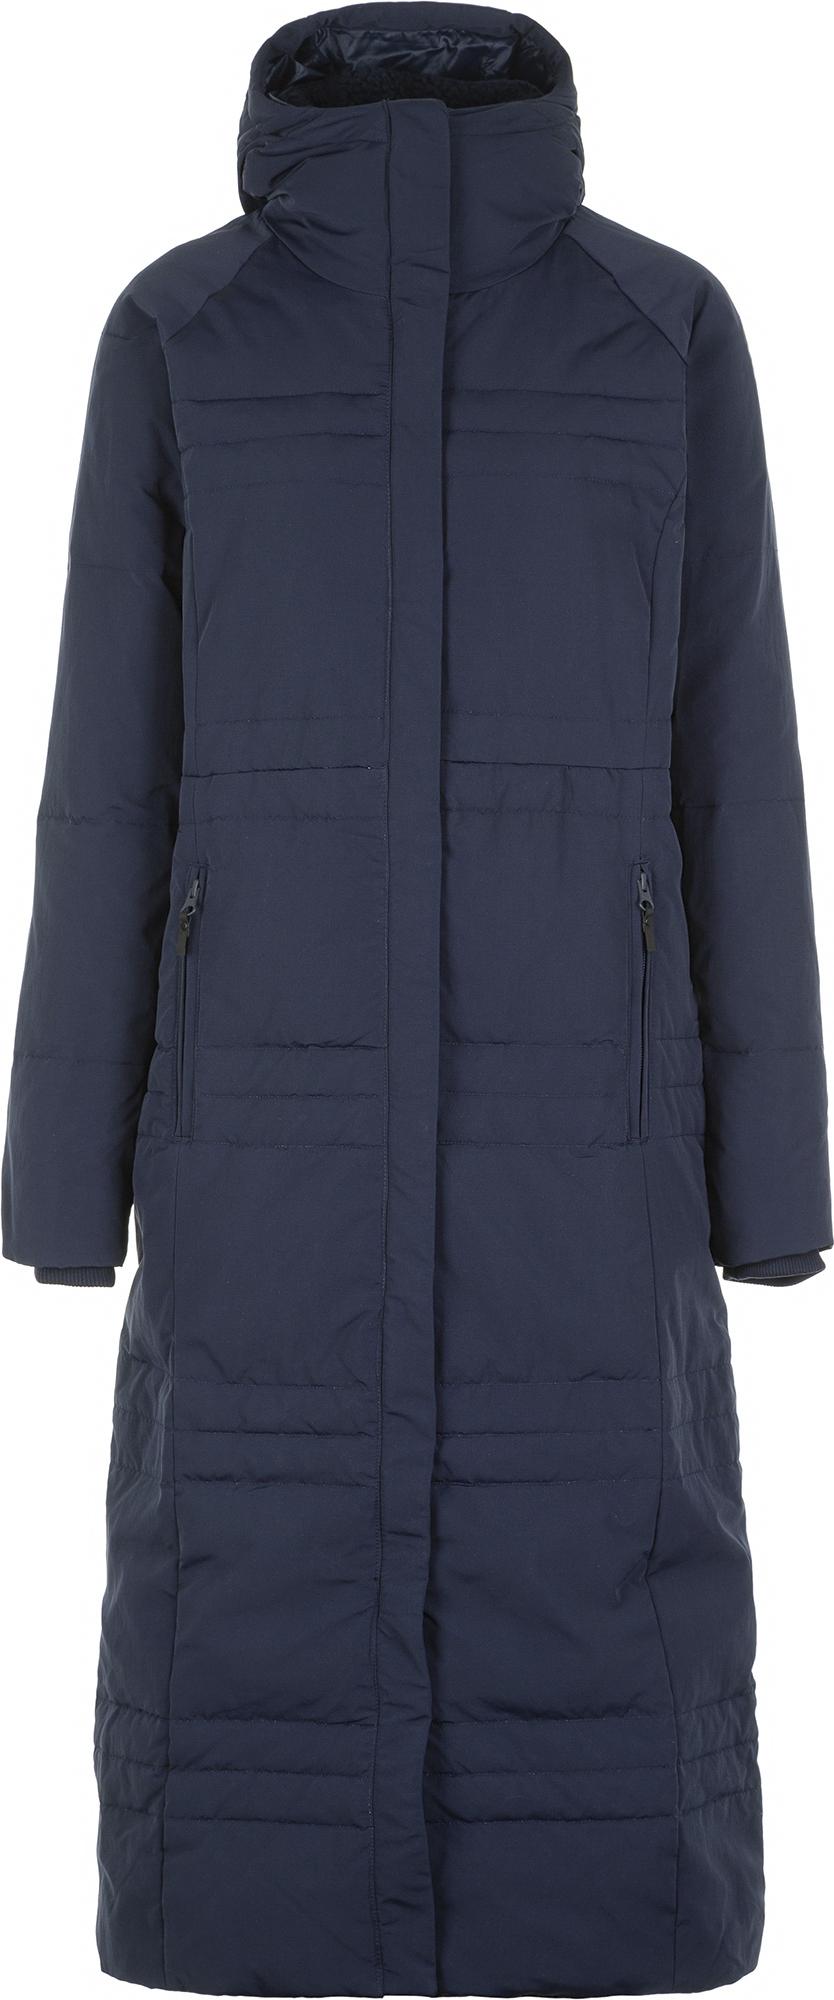 Columbia Куртка пуховая женская Ruby Falls, размер 50